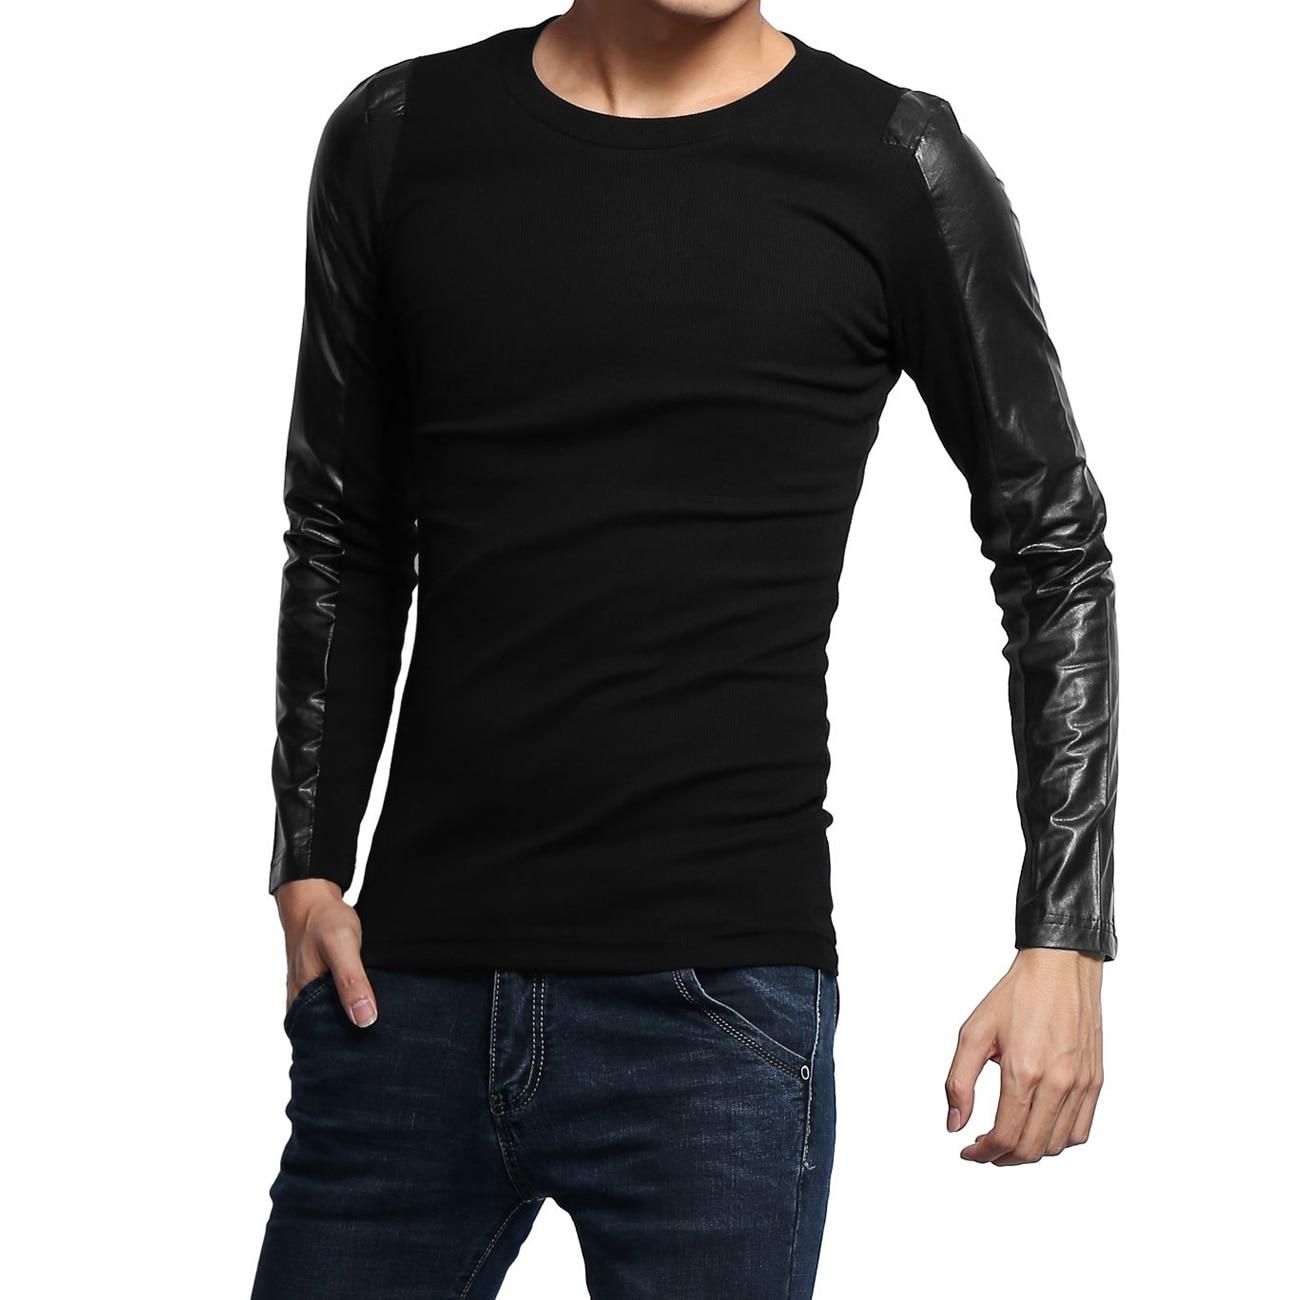 Aliexpress.com : Buy 2017 NEW Mens Fashion Long Sleeve T Shirts ...